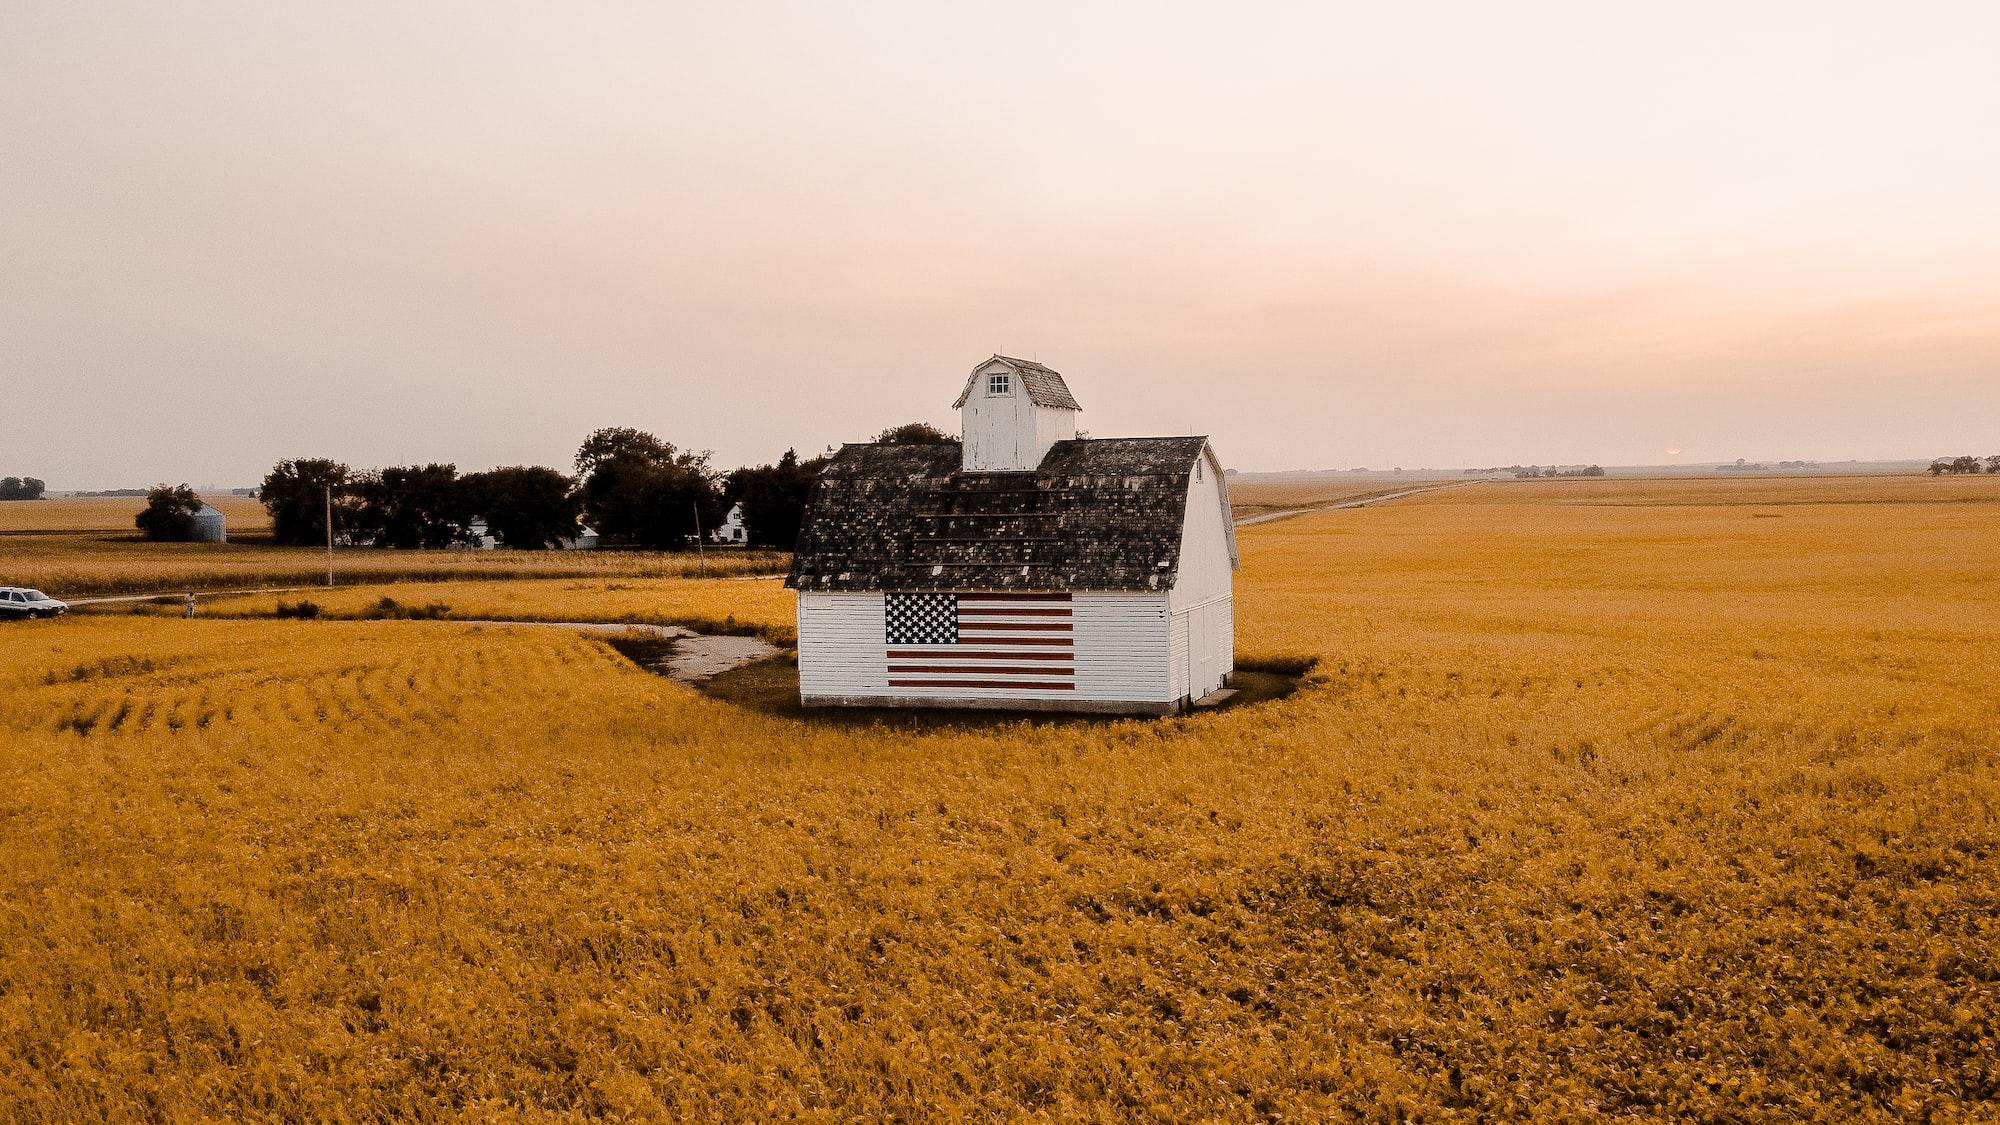 The Strange Case of Iowa: Debating Democracy